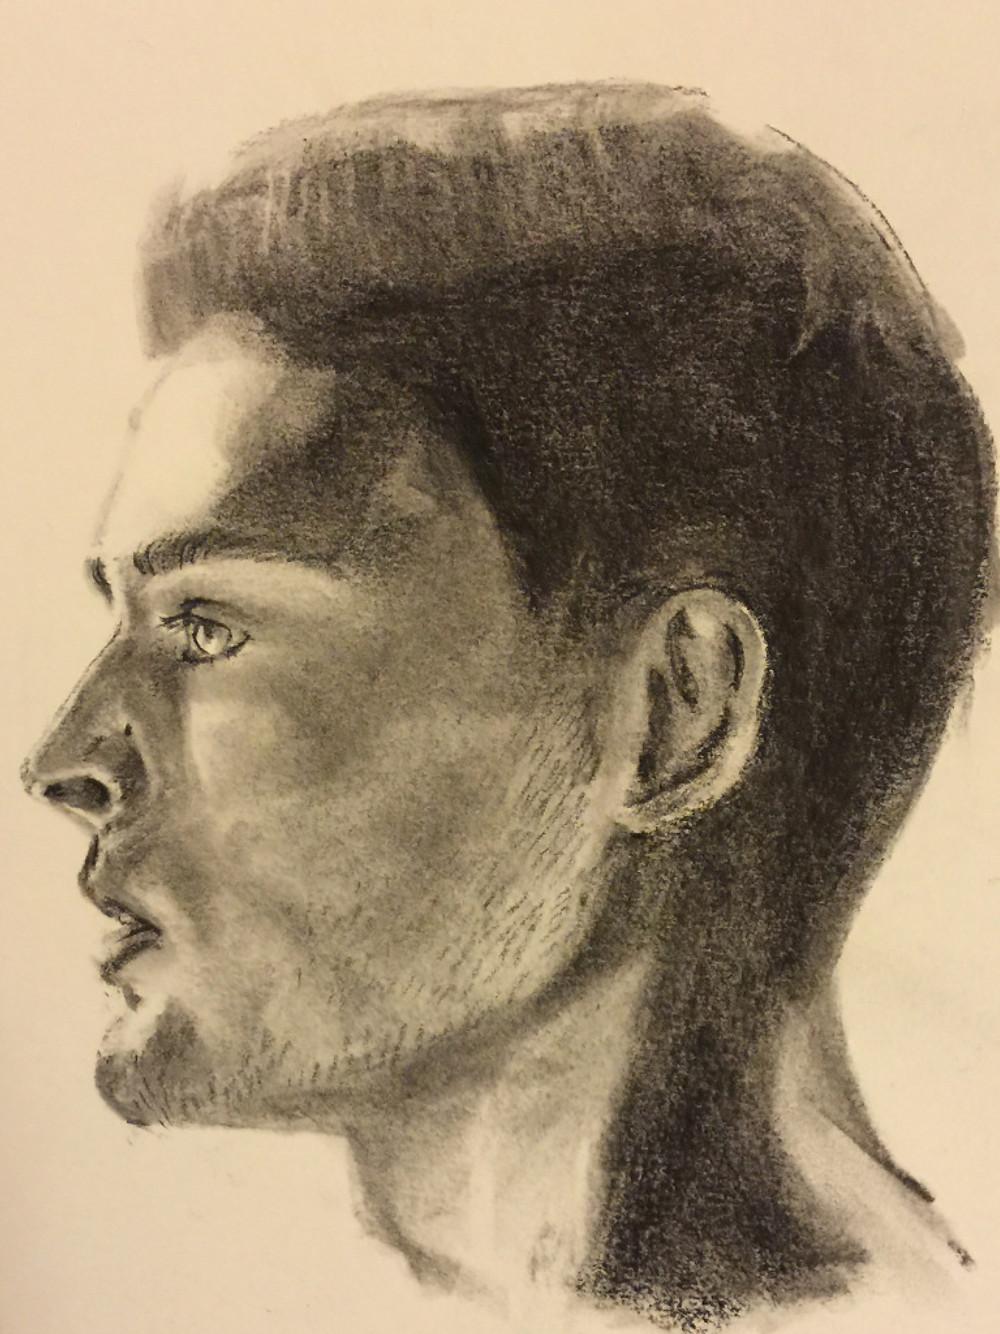 25/09/2015 : Profil masculin - 20 x 20 cm charcoal